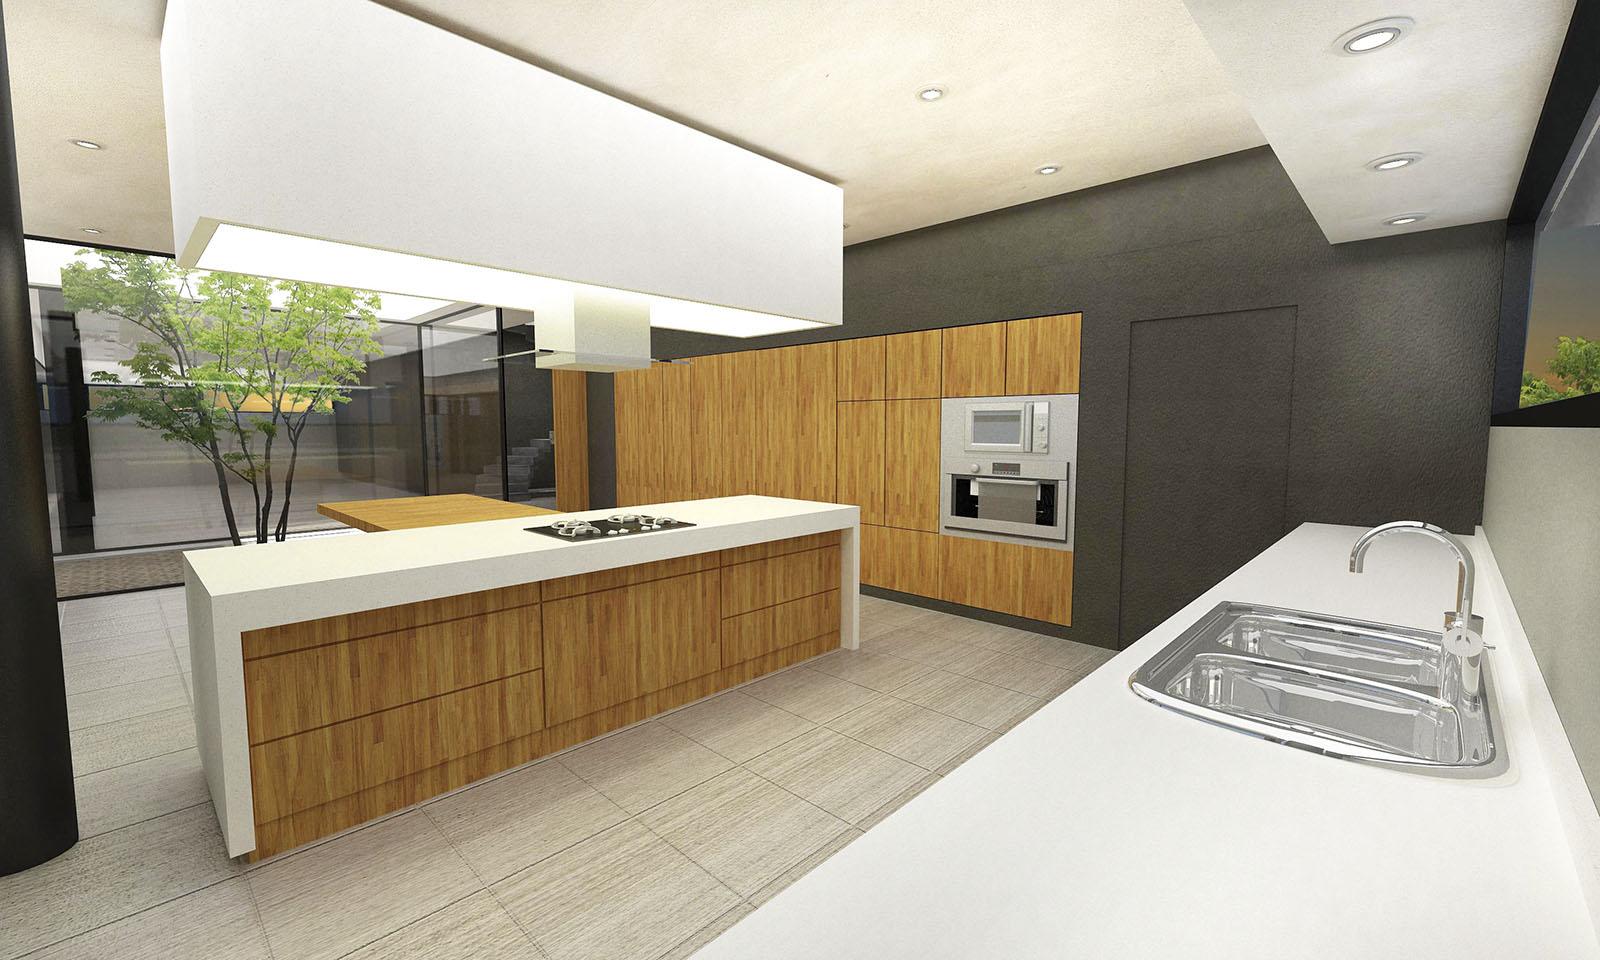 cocinas modernas, cocinas blancas, diseño de interiores, madera en cocinas